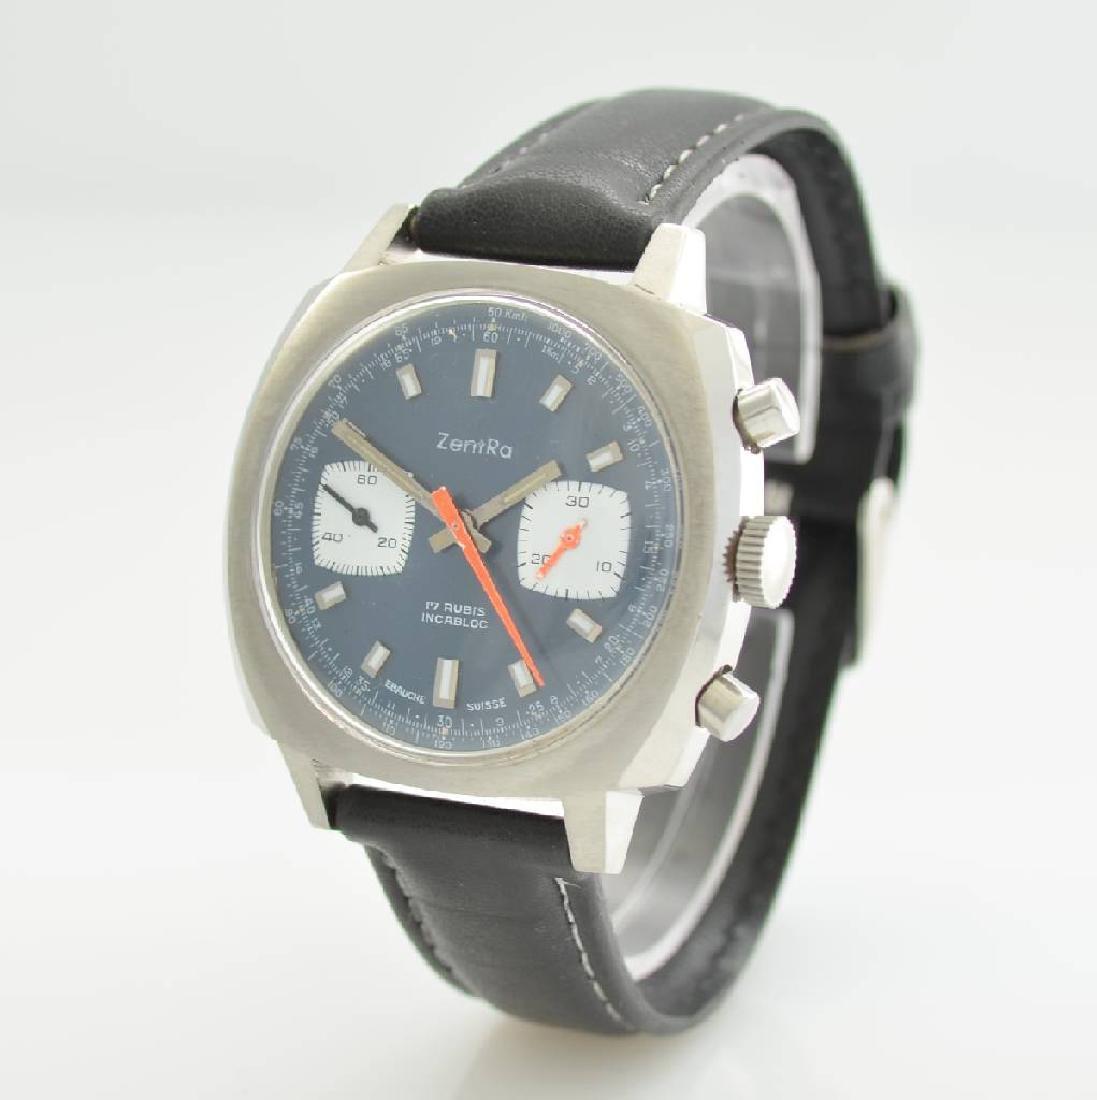 ZENTRA chronograph, Switzerland around 1970 - 3